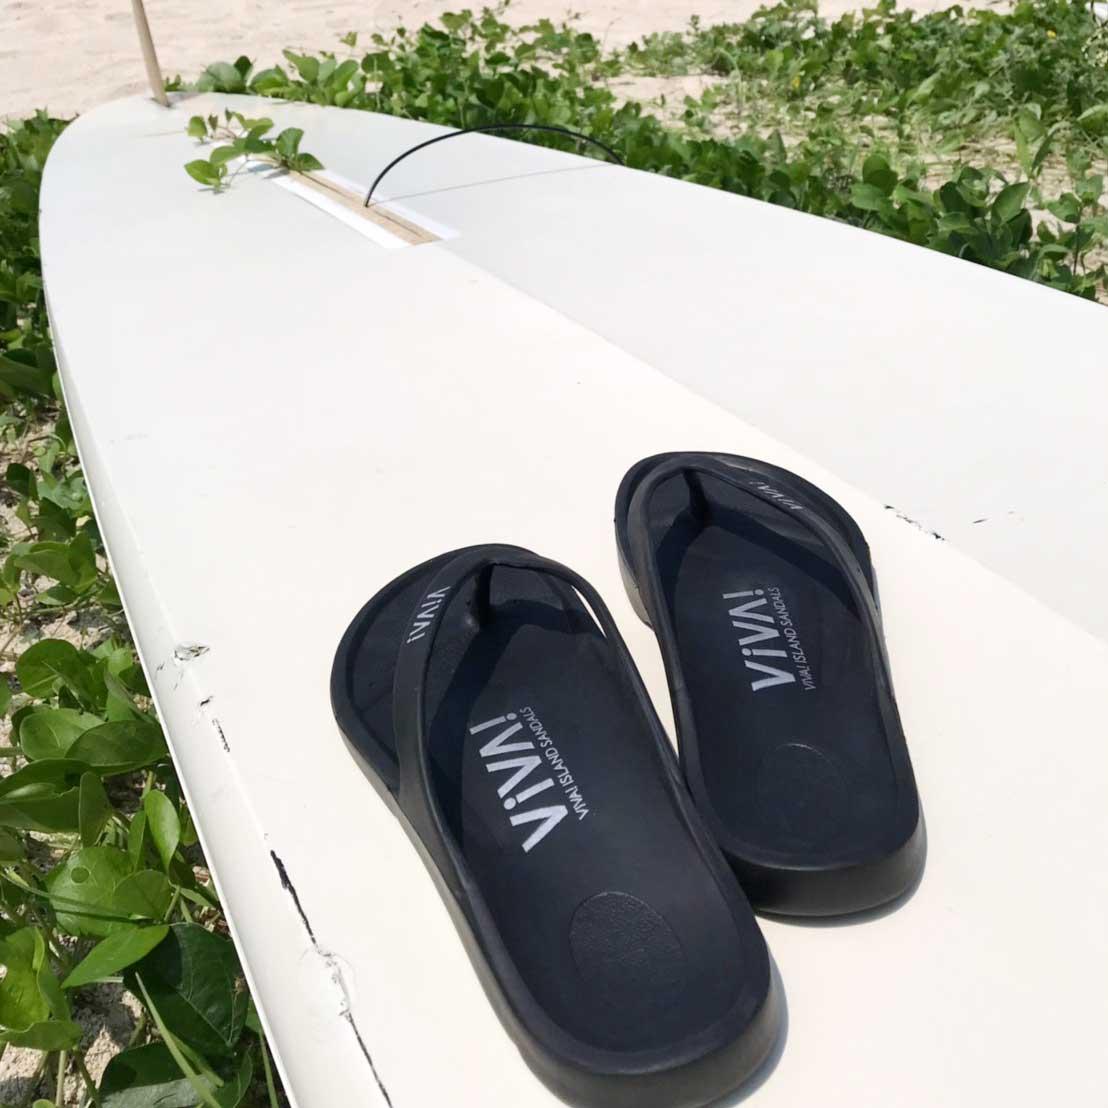 VIVA! ISLAND|ビバアイランド FLIP FLOP ビーチサンダル(ブラック|V-810102_BLK)